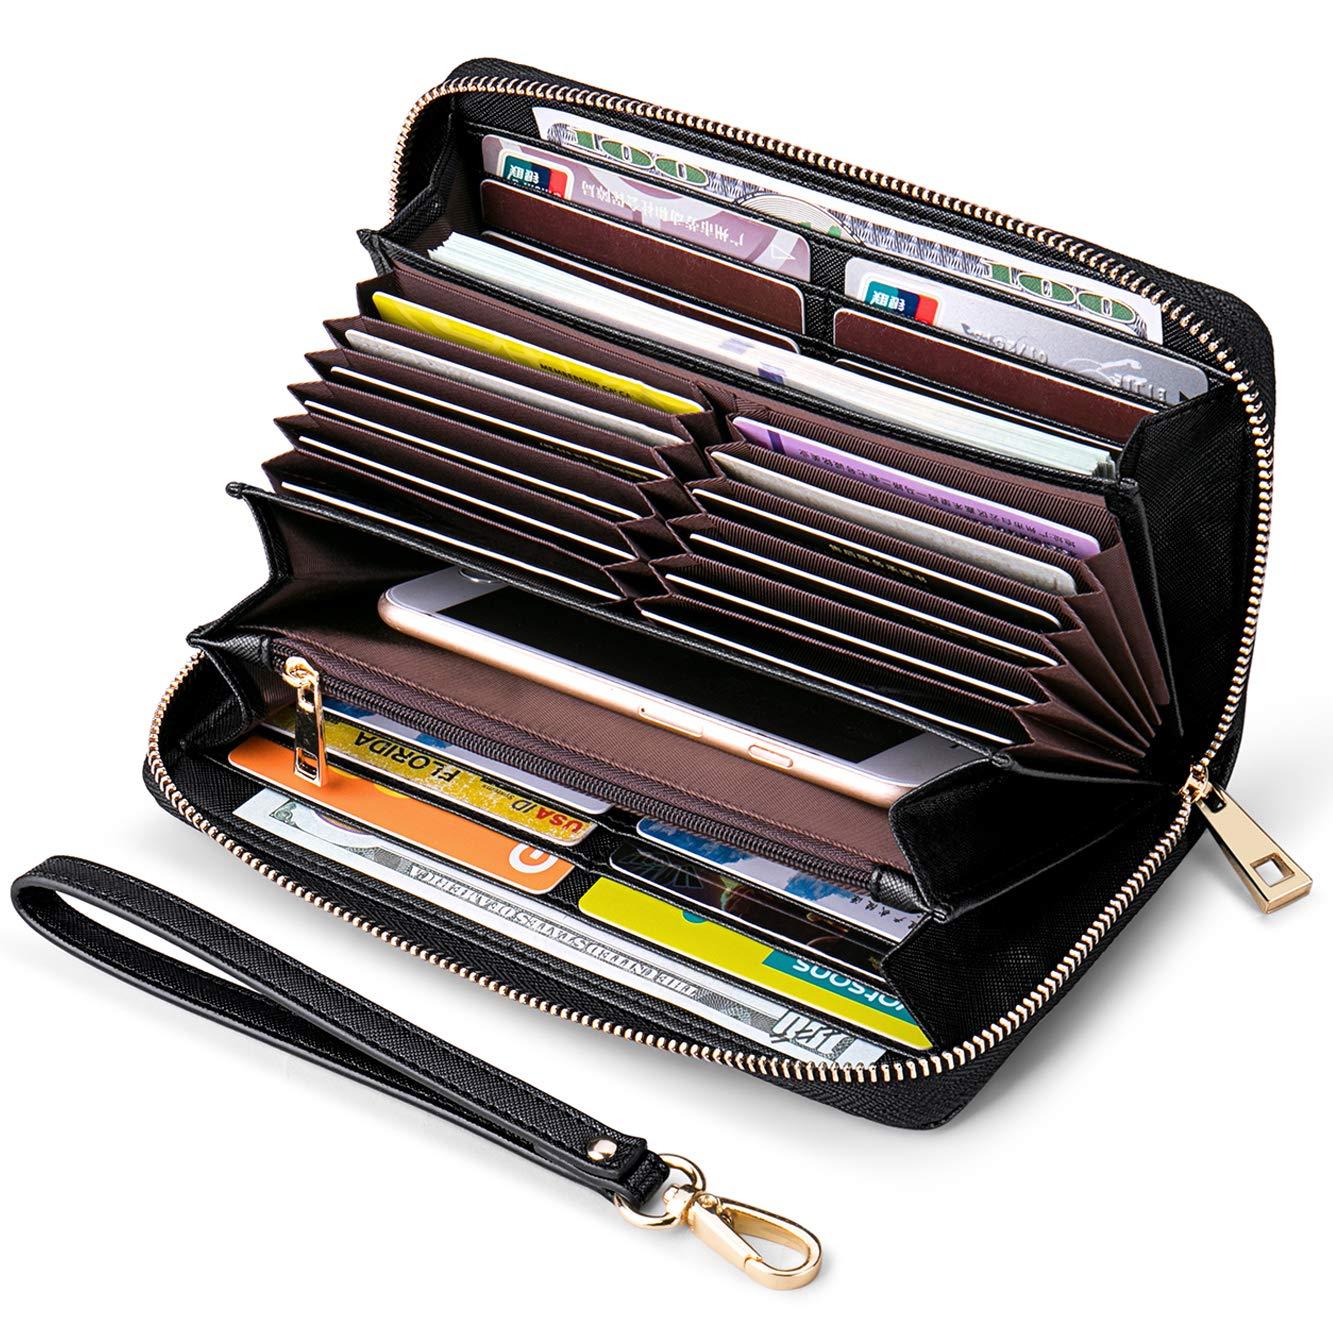 RFID Blocking Womens Wallets Credit Card Holder Wallet for Women Large Zipper Black Leather Travel Wristlet Clutch Wallets for Women